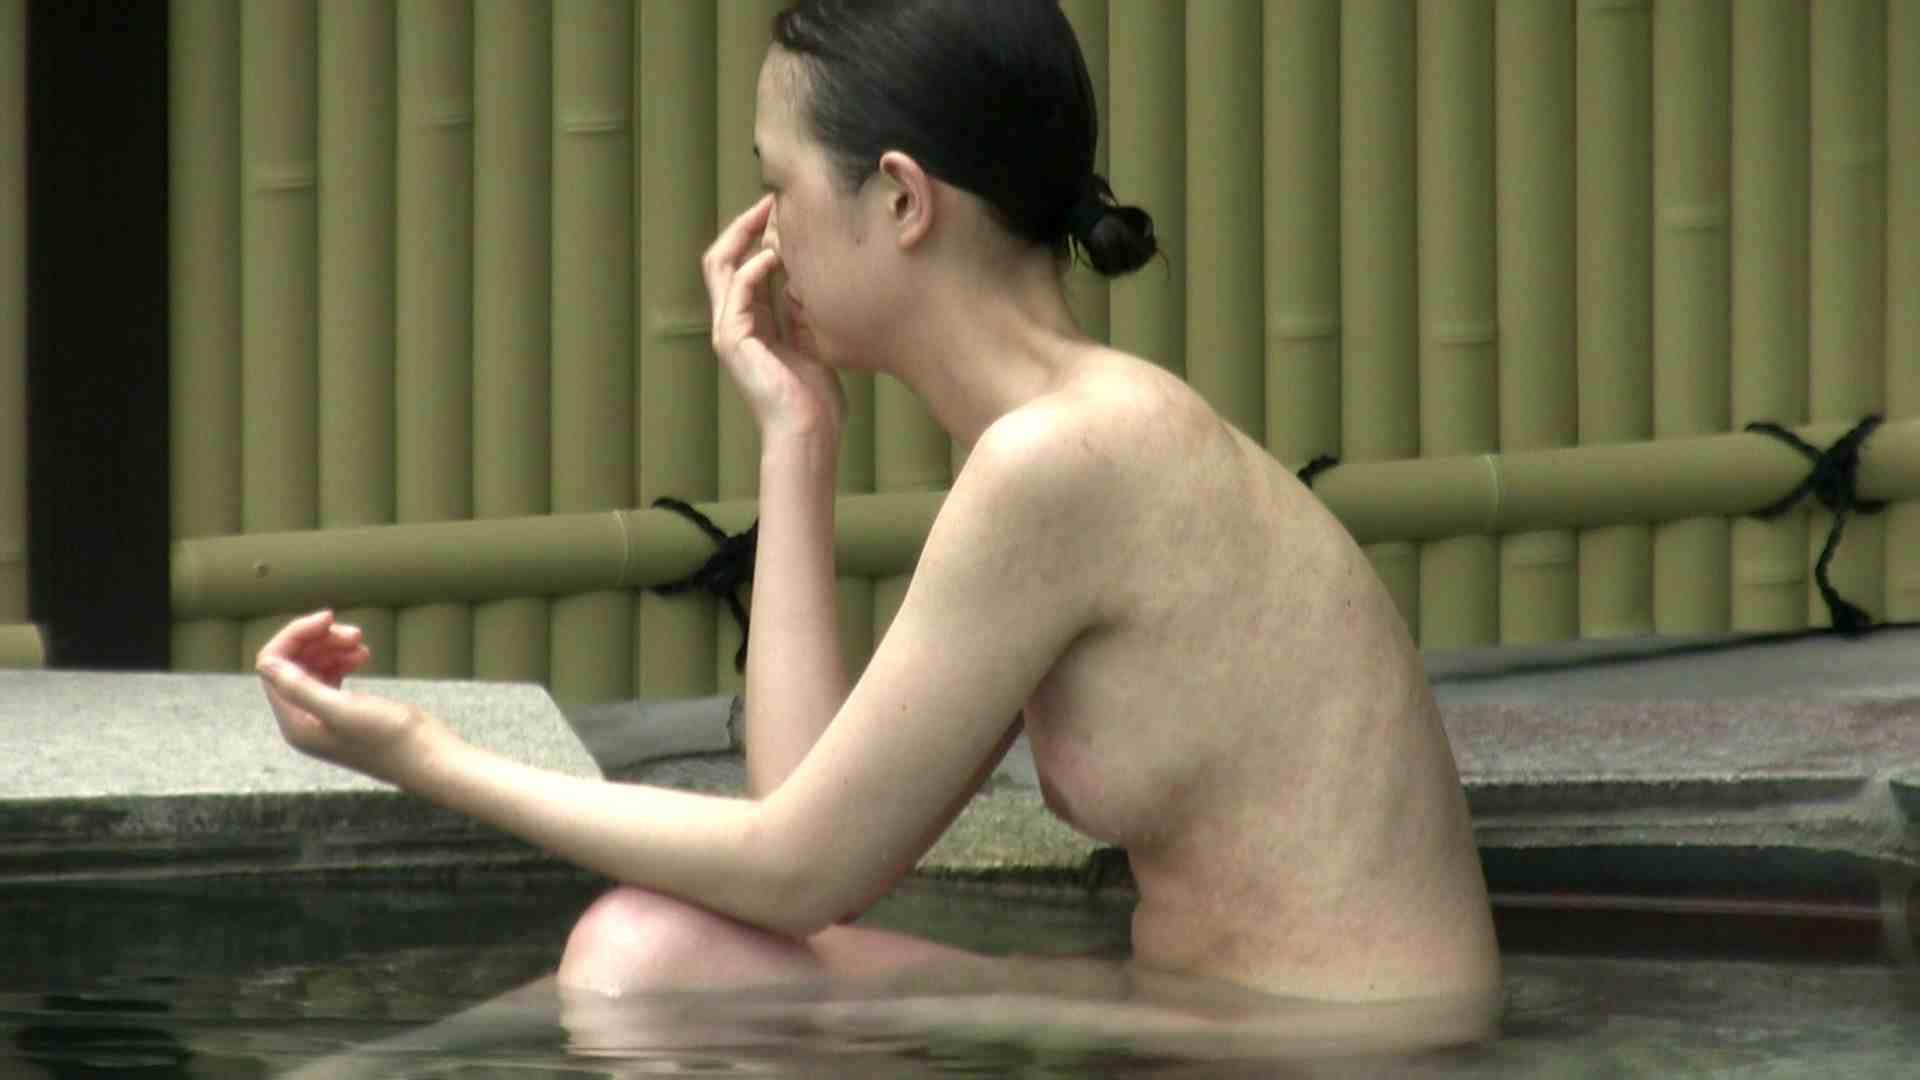 Aquaな露天風呂Vol.661 OLセックス  105画像 84